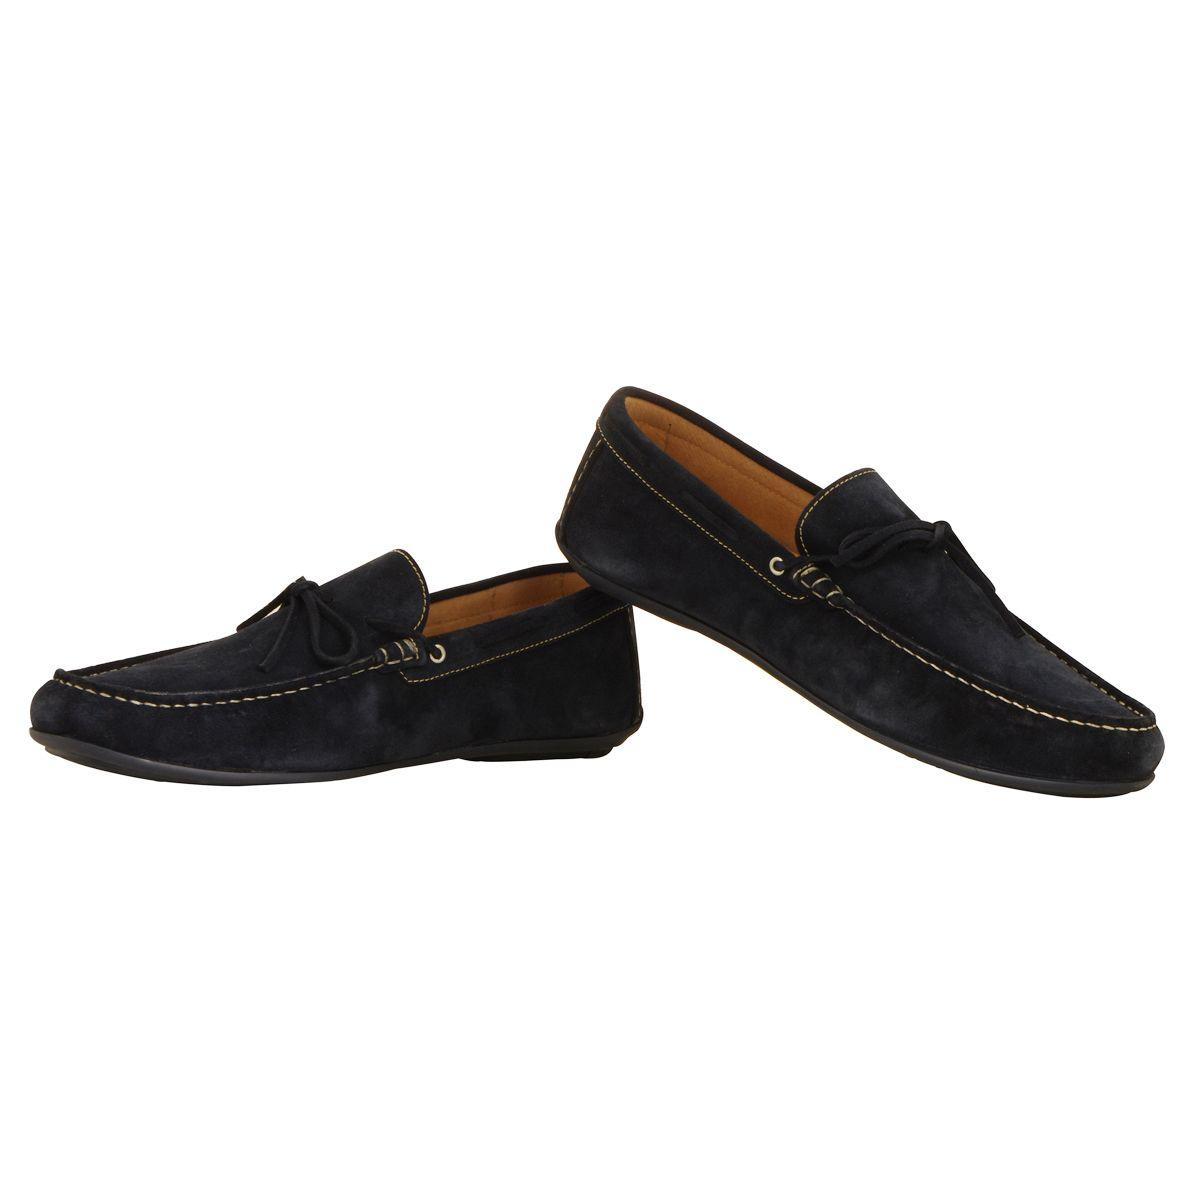 chaussures mocassins bleu marine grande taille jusqu 39 au. Black Bedroom Furniture Sets. Home Design Ideas